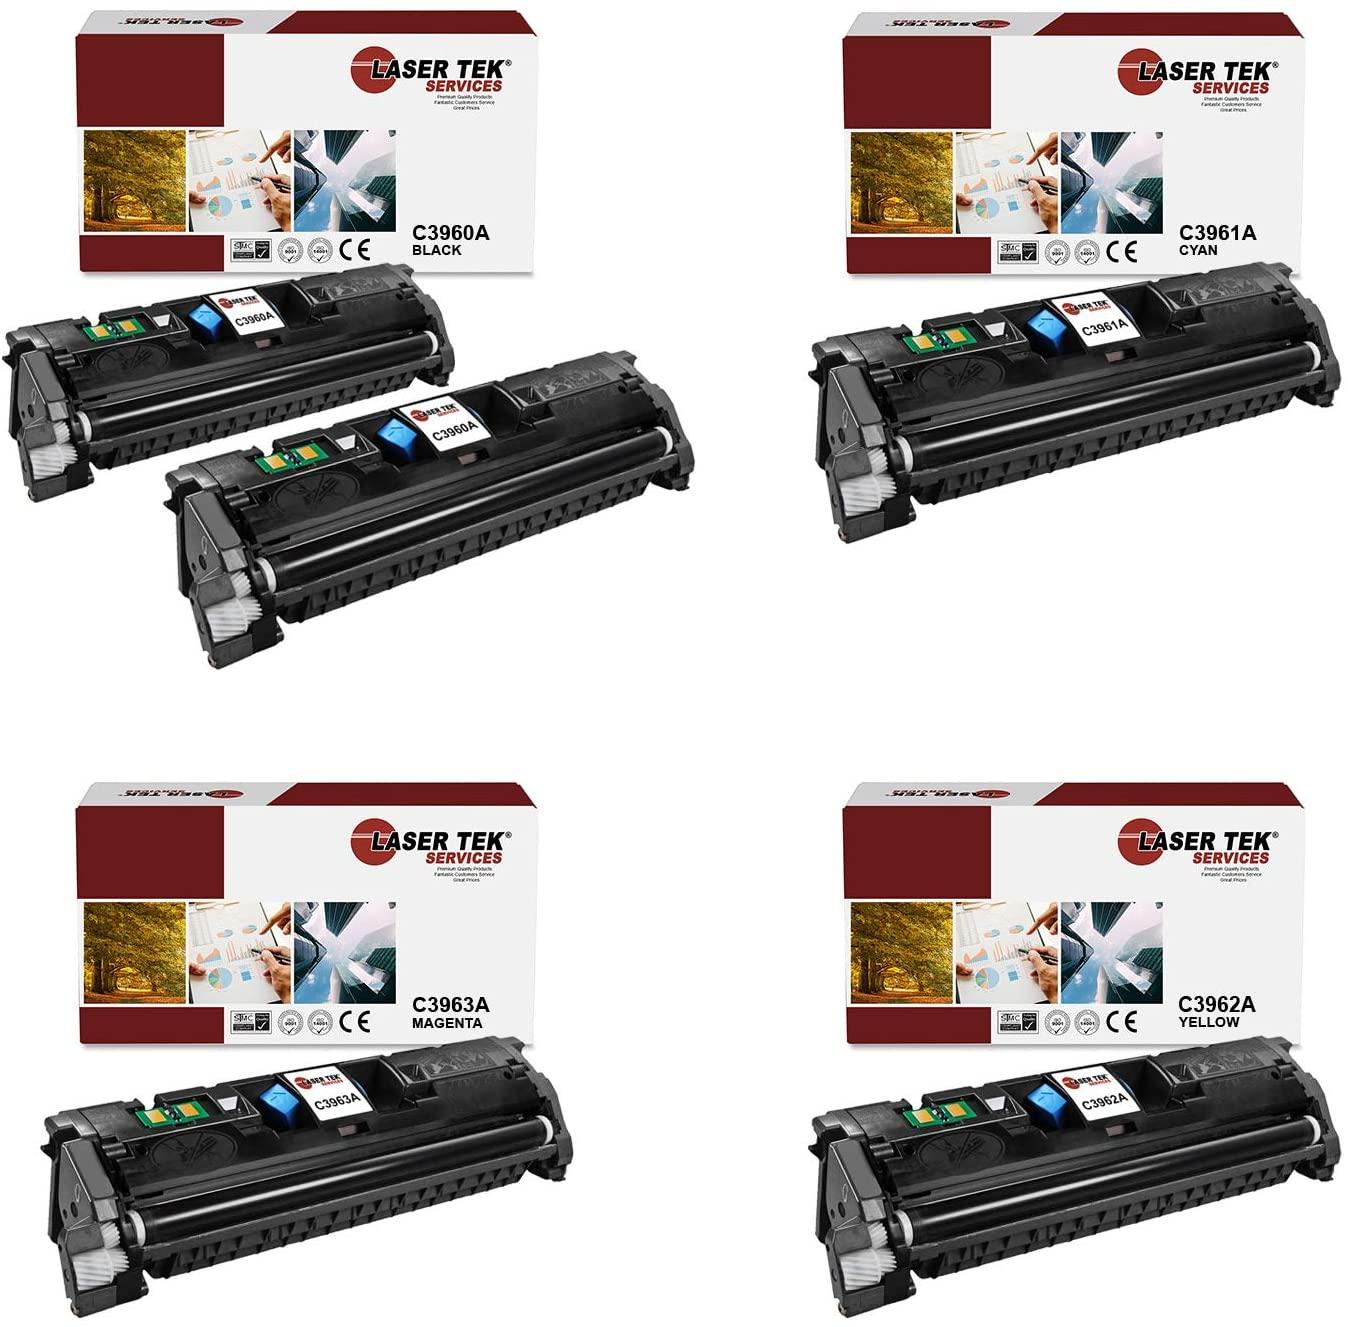 Laser Tek Services Compatible HP 122A C3960A C3961A C3962A C3963A Toner Cartridge Replacement for HP Color Laserjet 1500 1500L 2500 2500L 2500n Printers (Black, Cyan, Magenta, Yellow,5 Pack)